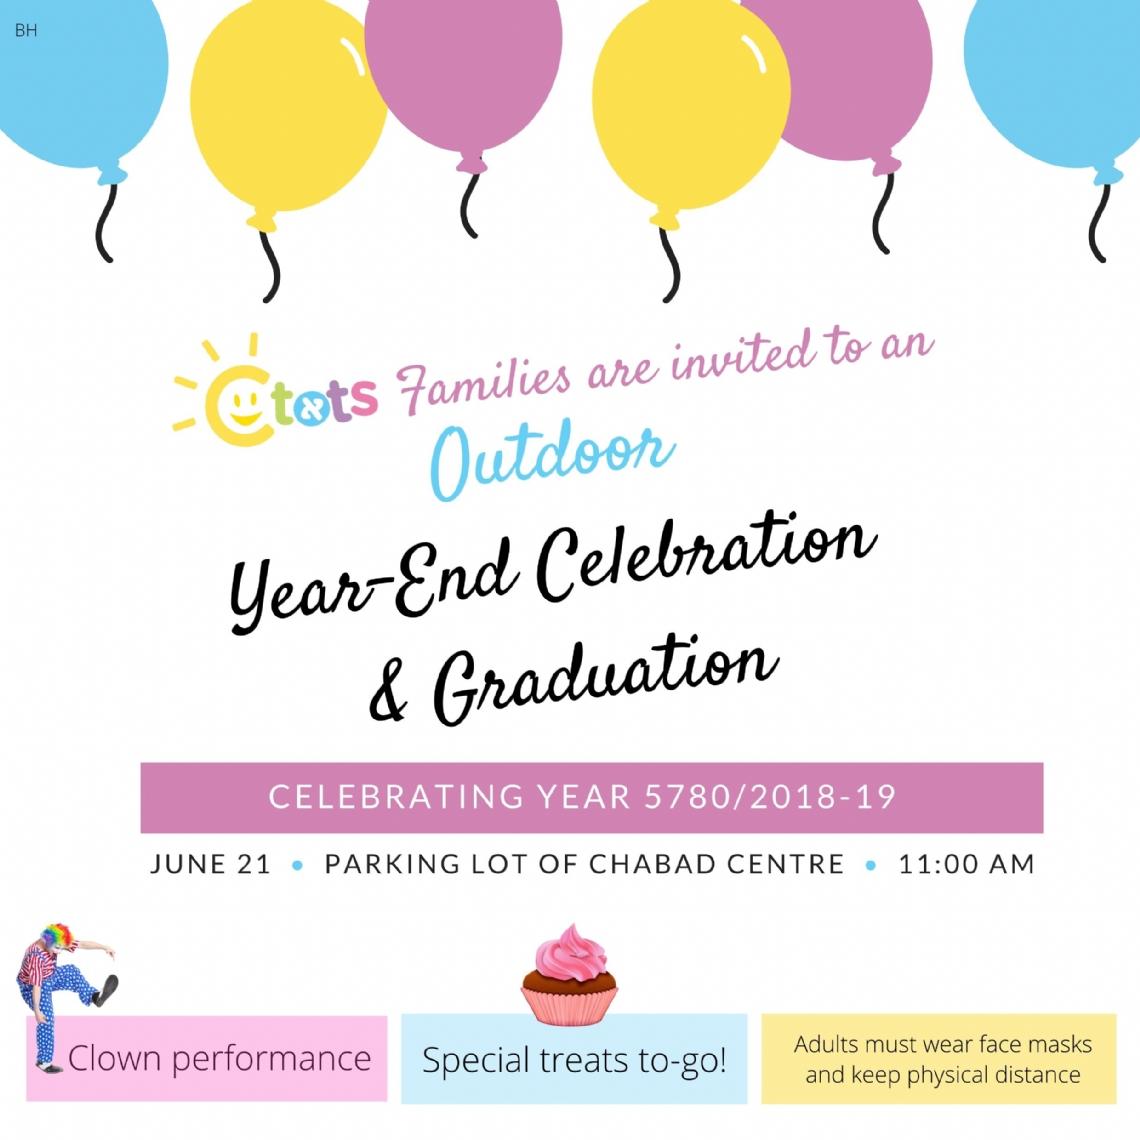 Ctots year end invite.jpg